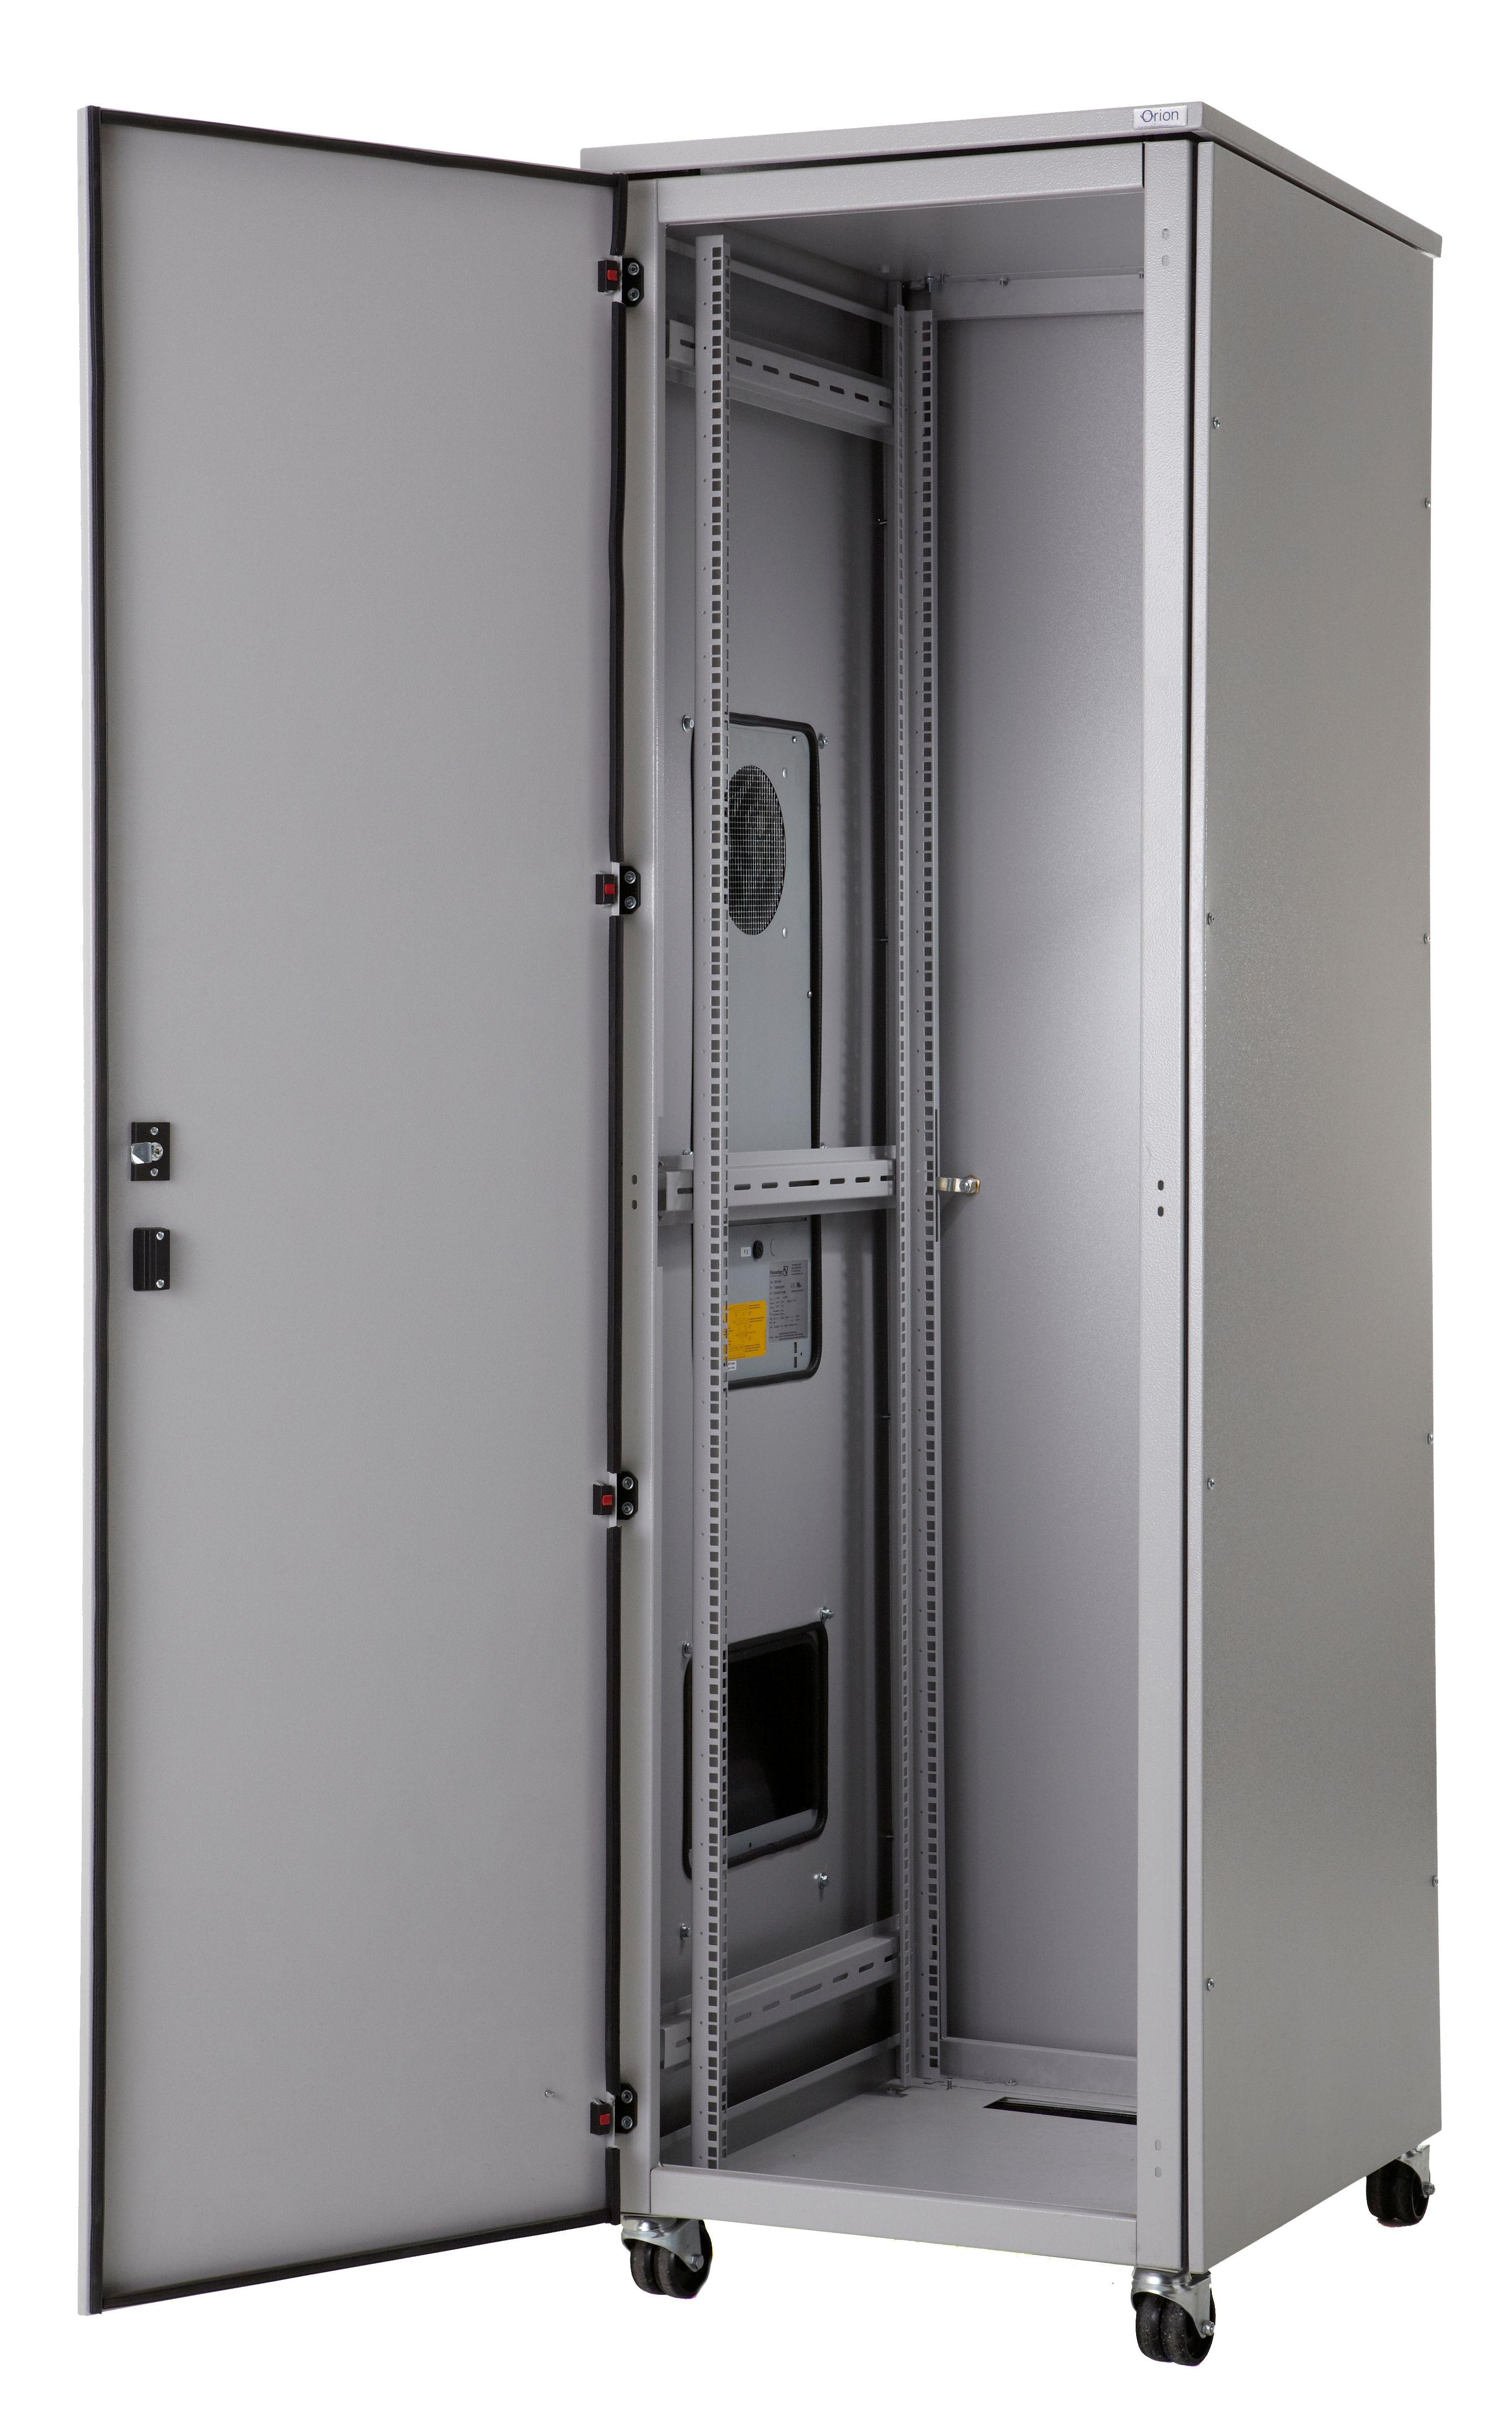 Tremendous Air Conditioned Server Cabinet Open Door Orion Rack Interior Design Ideas Gentotthenellocom